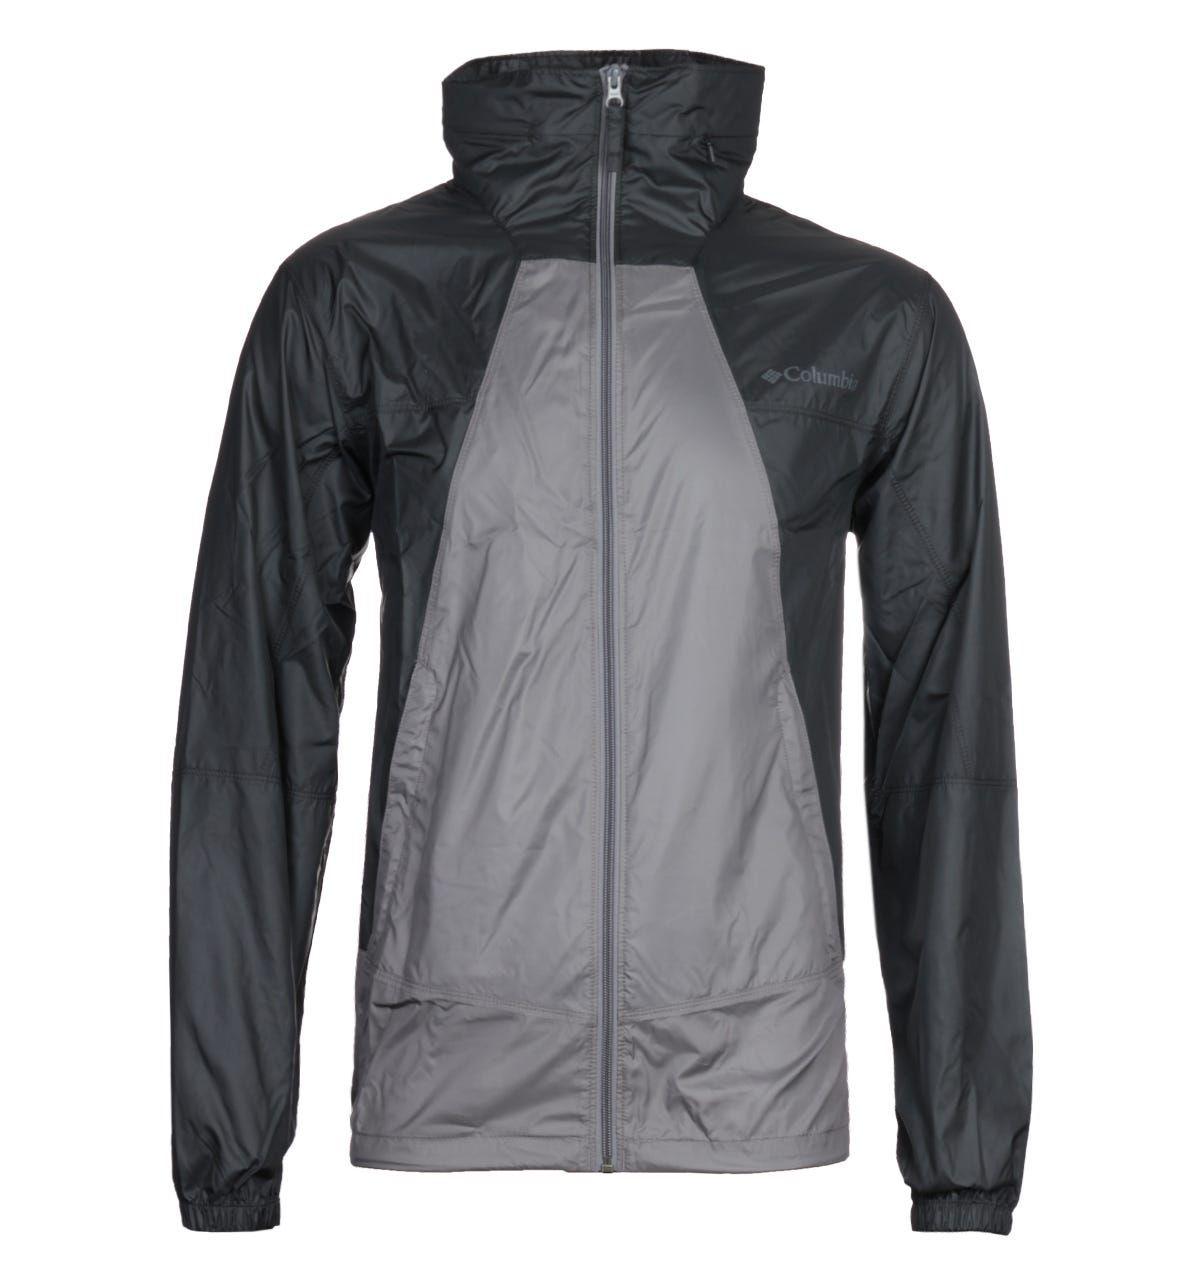 Columbia Grey & Black Point Park Windbreaker Jacket